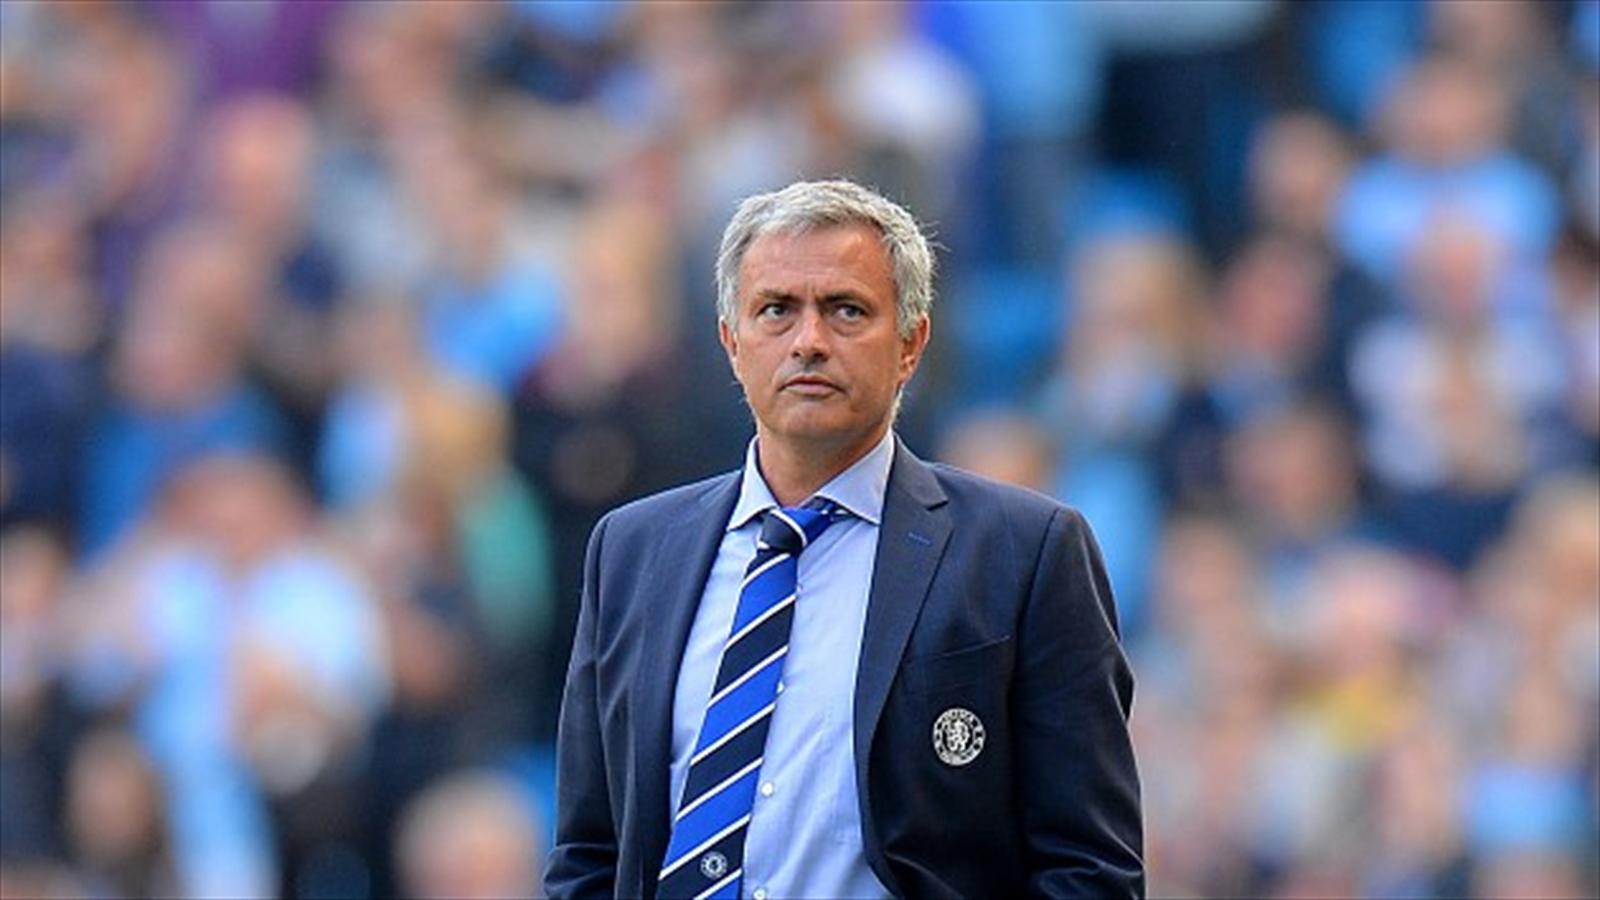 Jose mourinho chelsea 2018 training